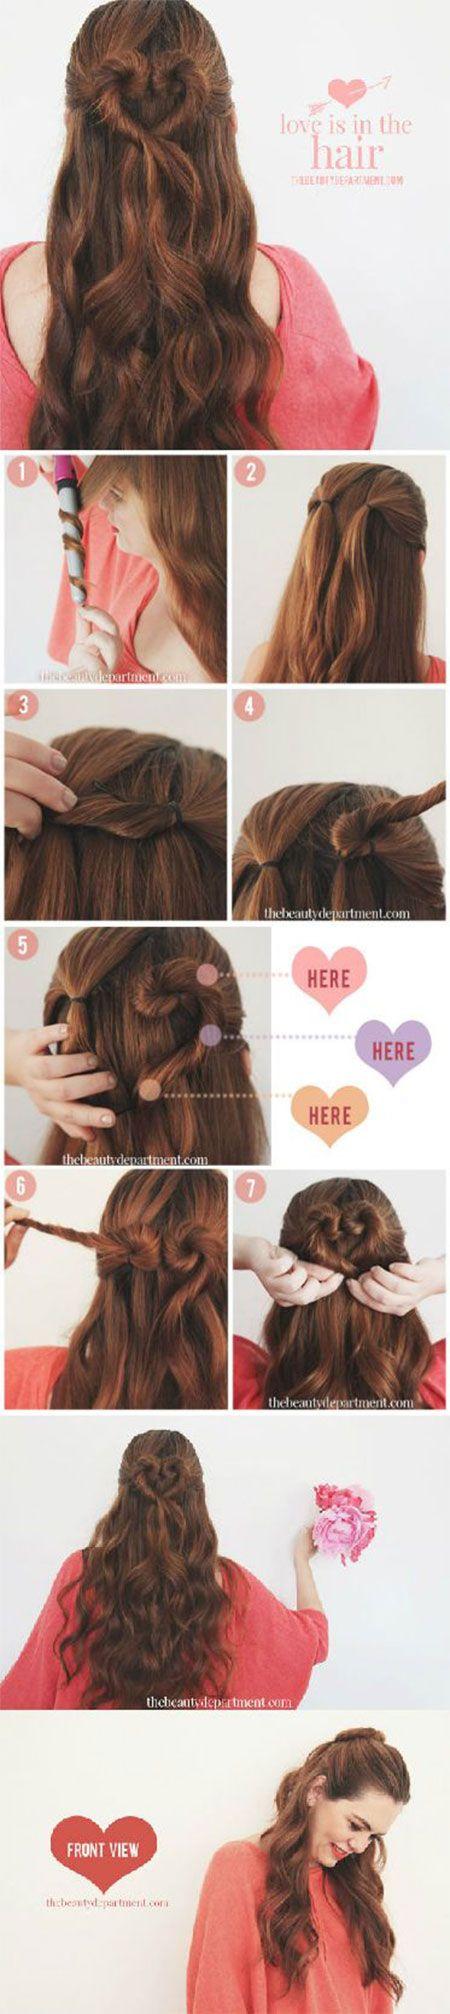 Terrific 1000 Ideas About Easy Hairstyles Tutorials On Pinterest Easy Short Hairstyles Gunalazisus